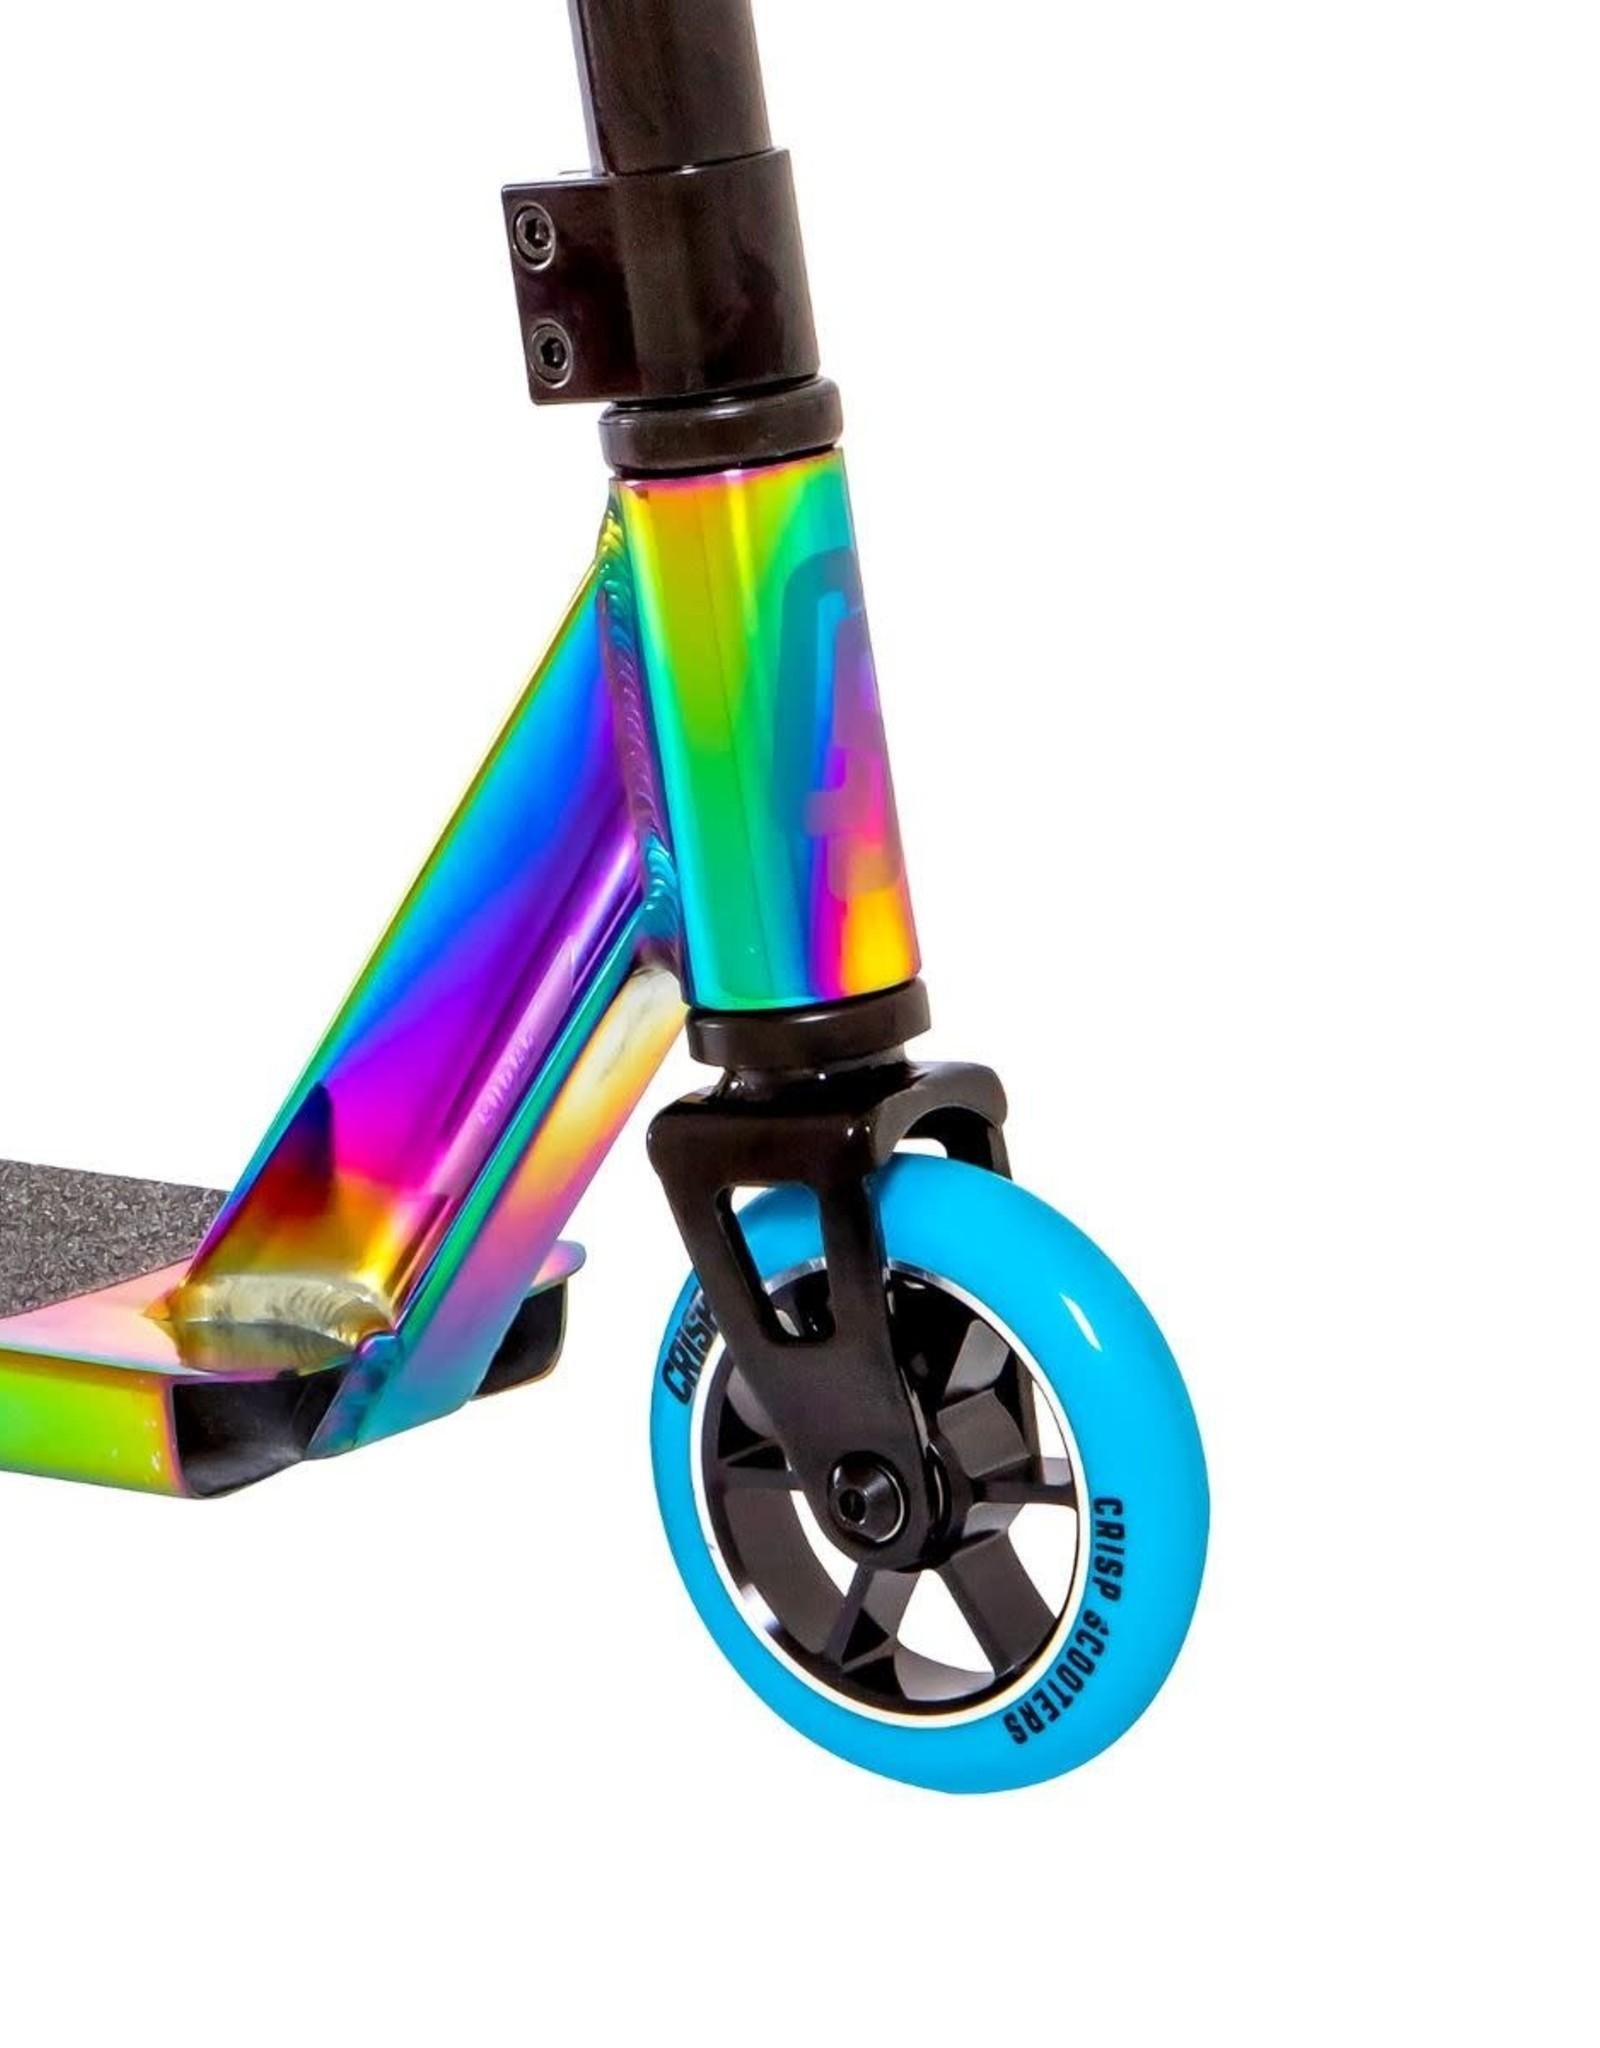 CRISP Crisp Surge Scooter Oil Slick Blue